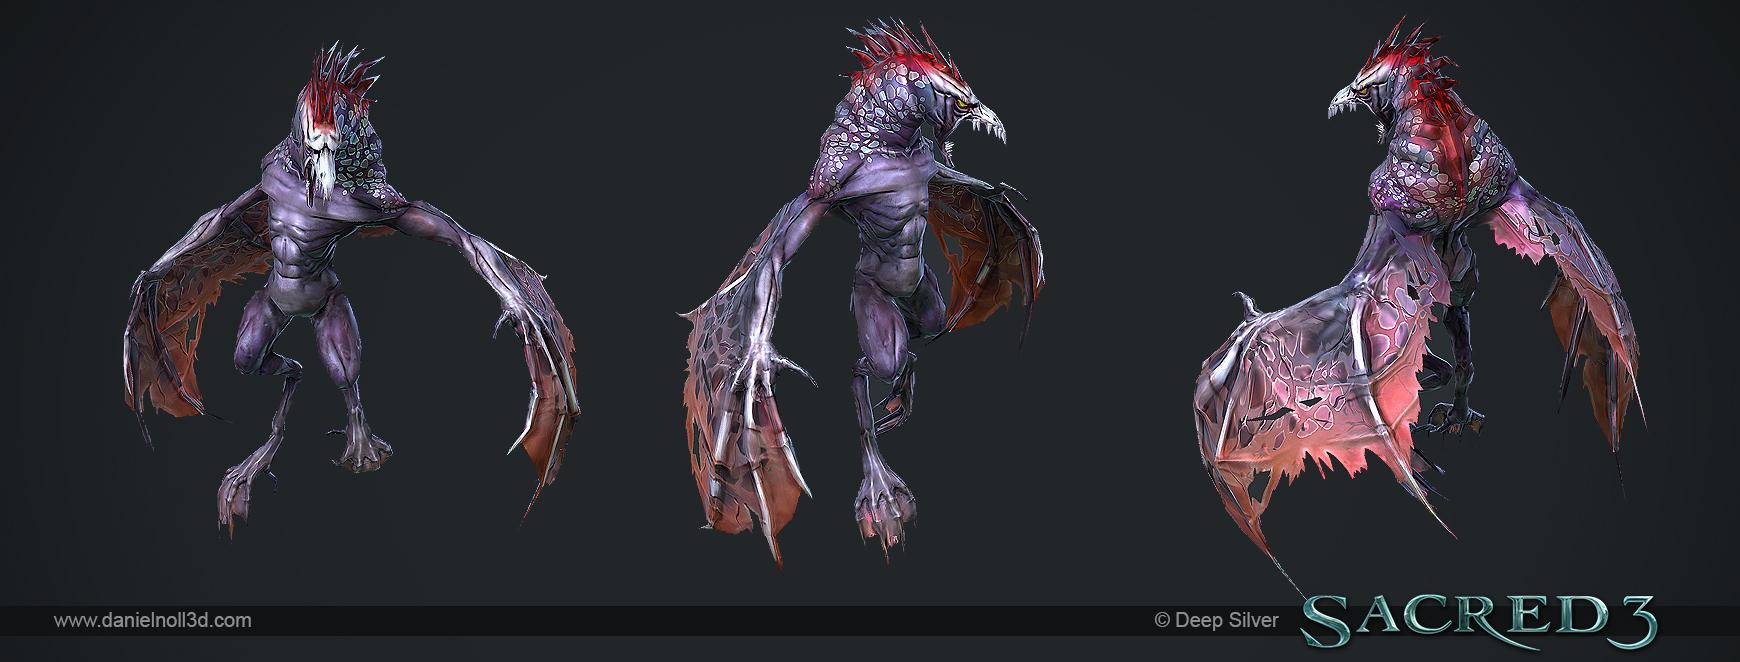 Harpy_Game.jpg